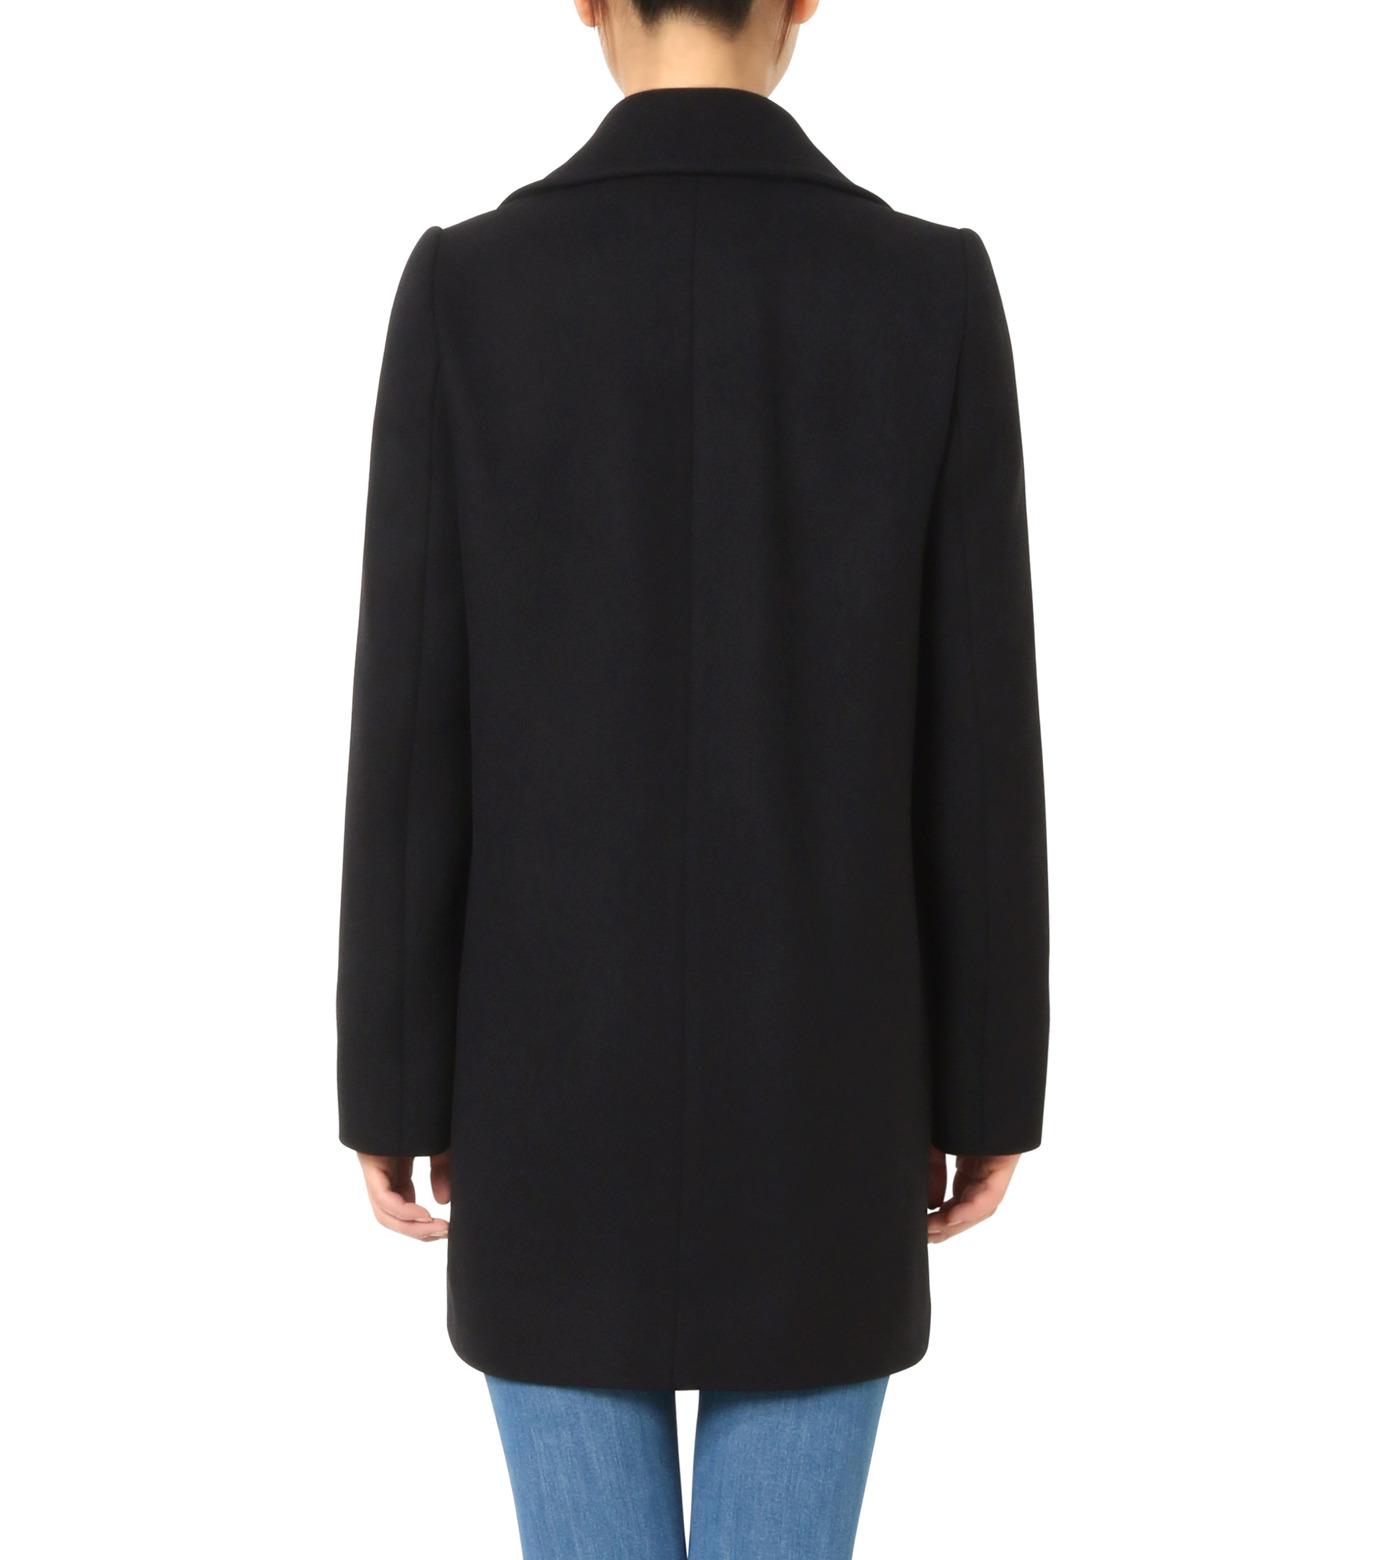 Stella McCartney(ステラマッカートニー)のWool Melton Short Coat-BLACK(コート/coat)-393143-SDB40-13 拡大詳細画像2